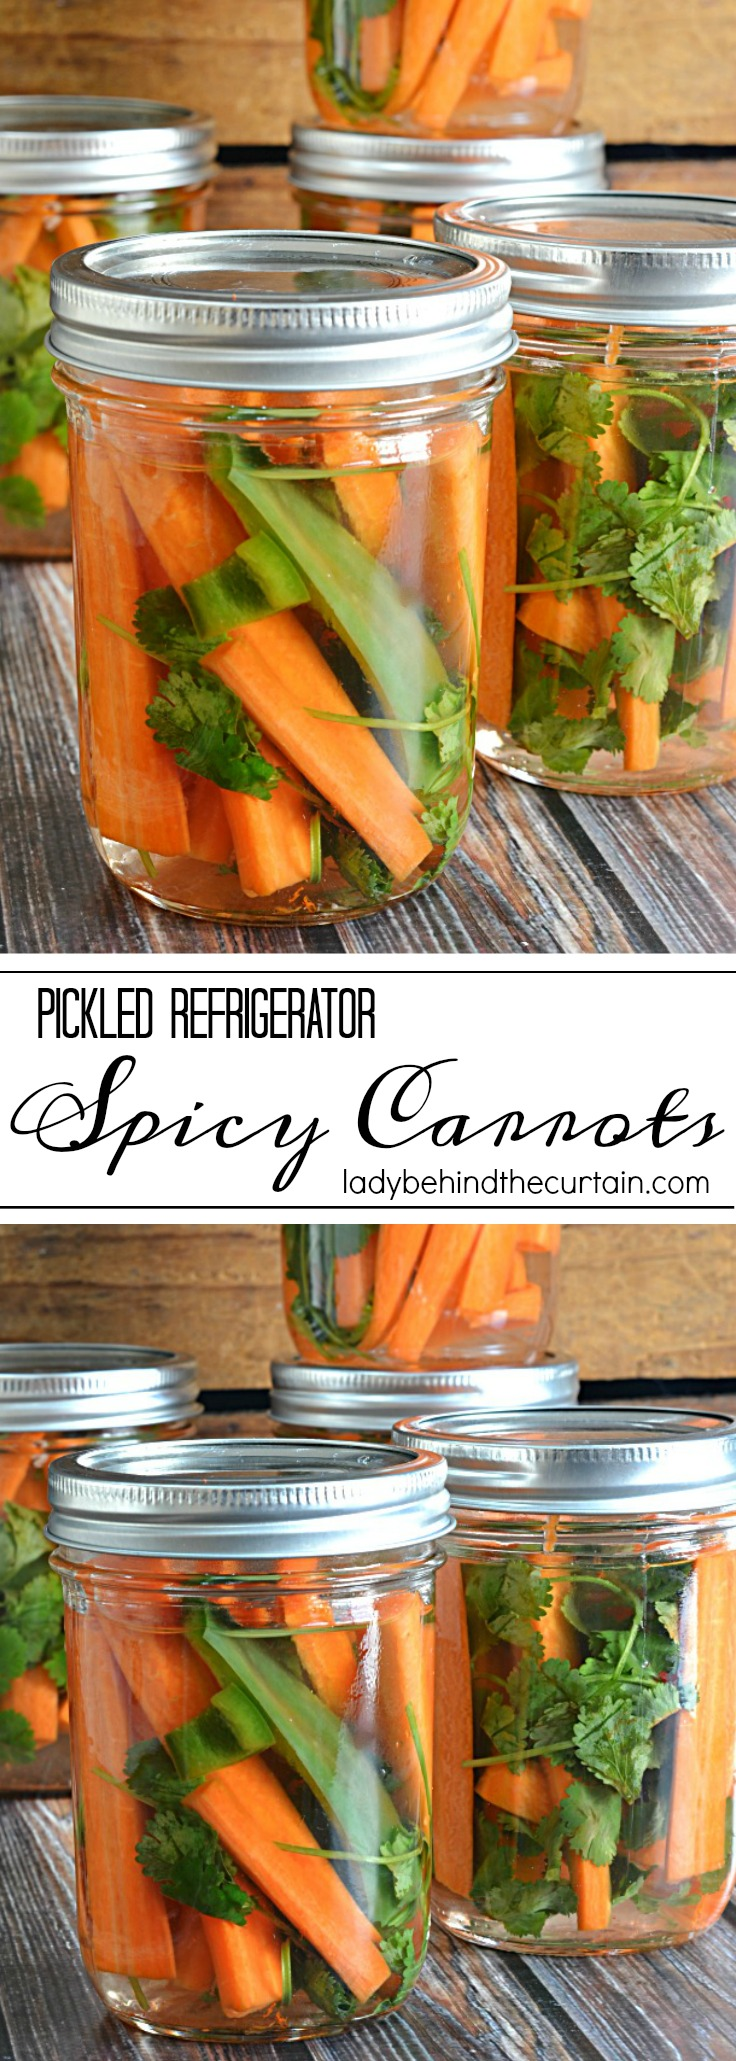 Pickled Refrigerator Spicy Carrots | easy recipe, picnic recipe, hostess gift idea, side dish